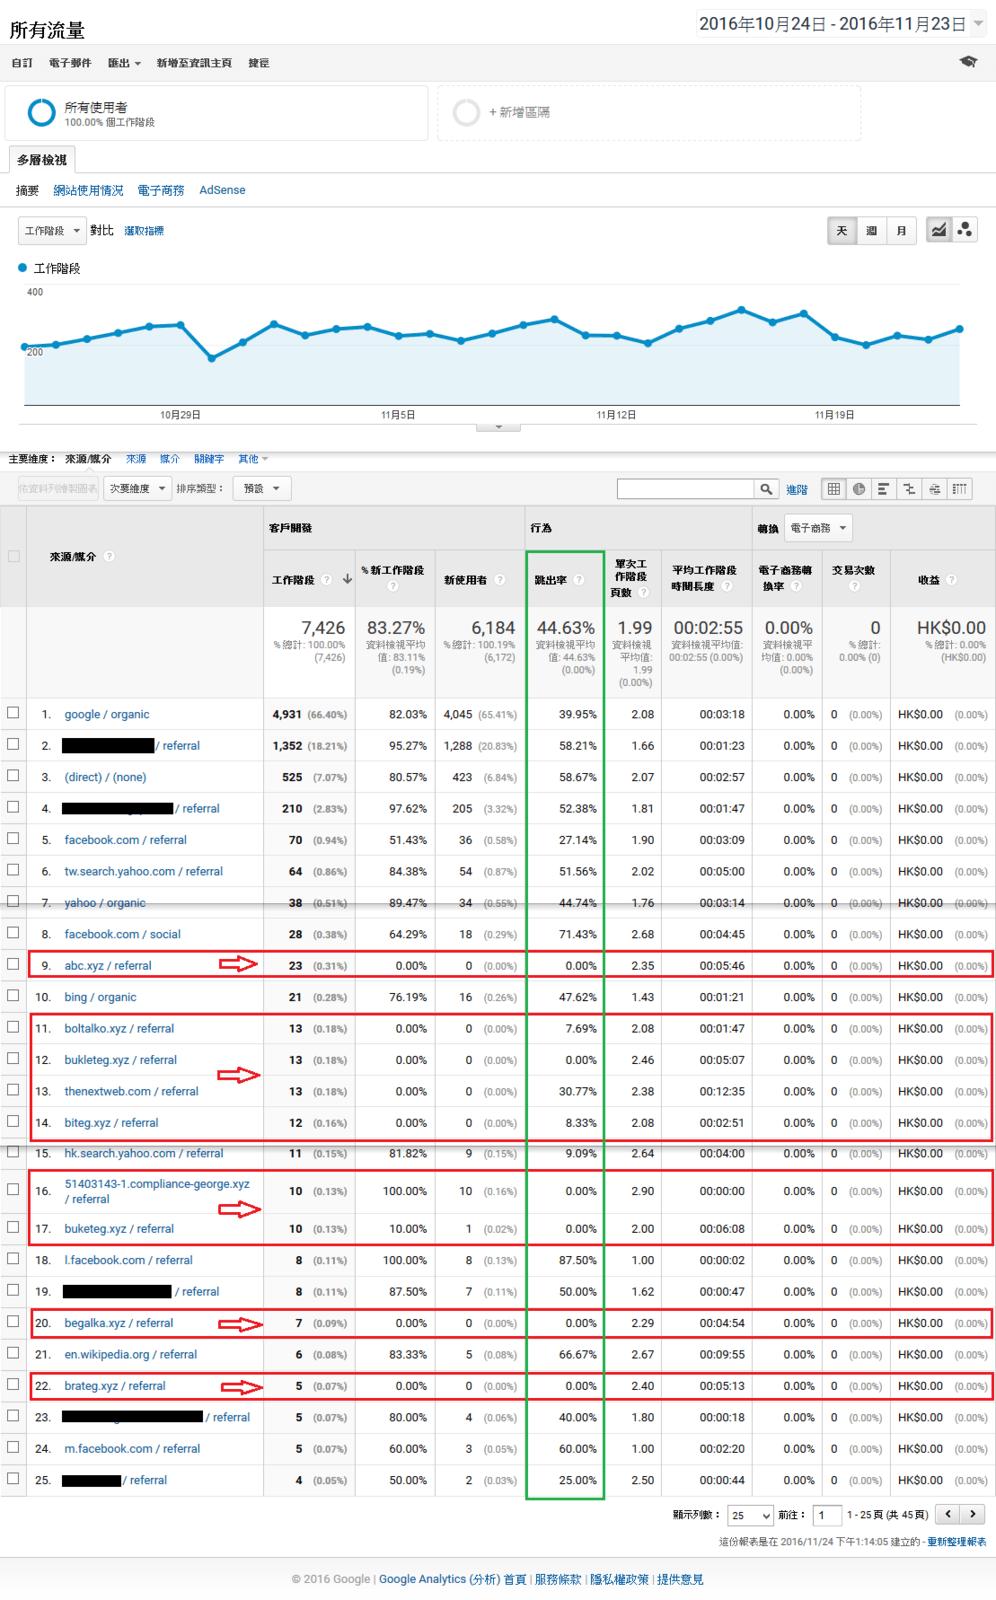 google-analytics-spam-referral-traffic